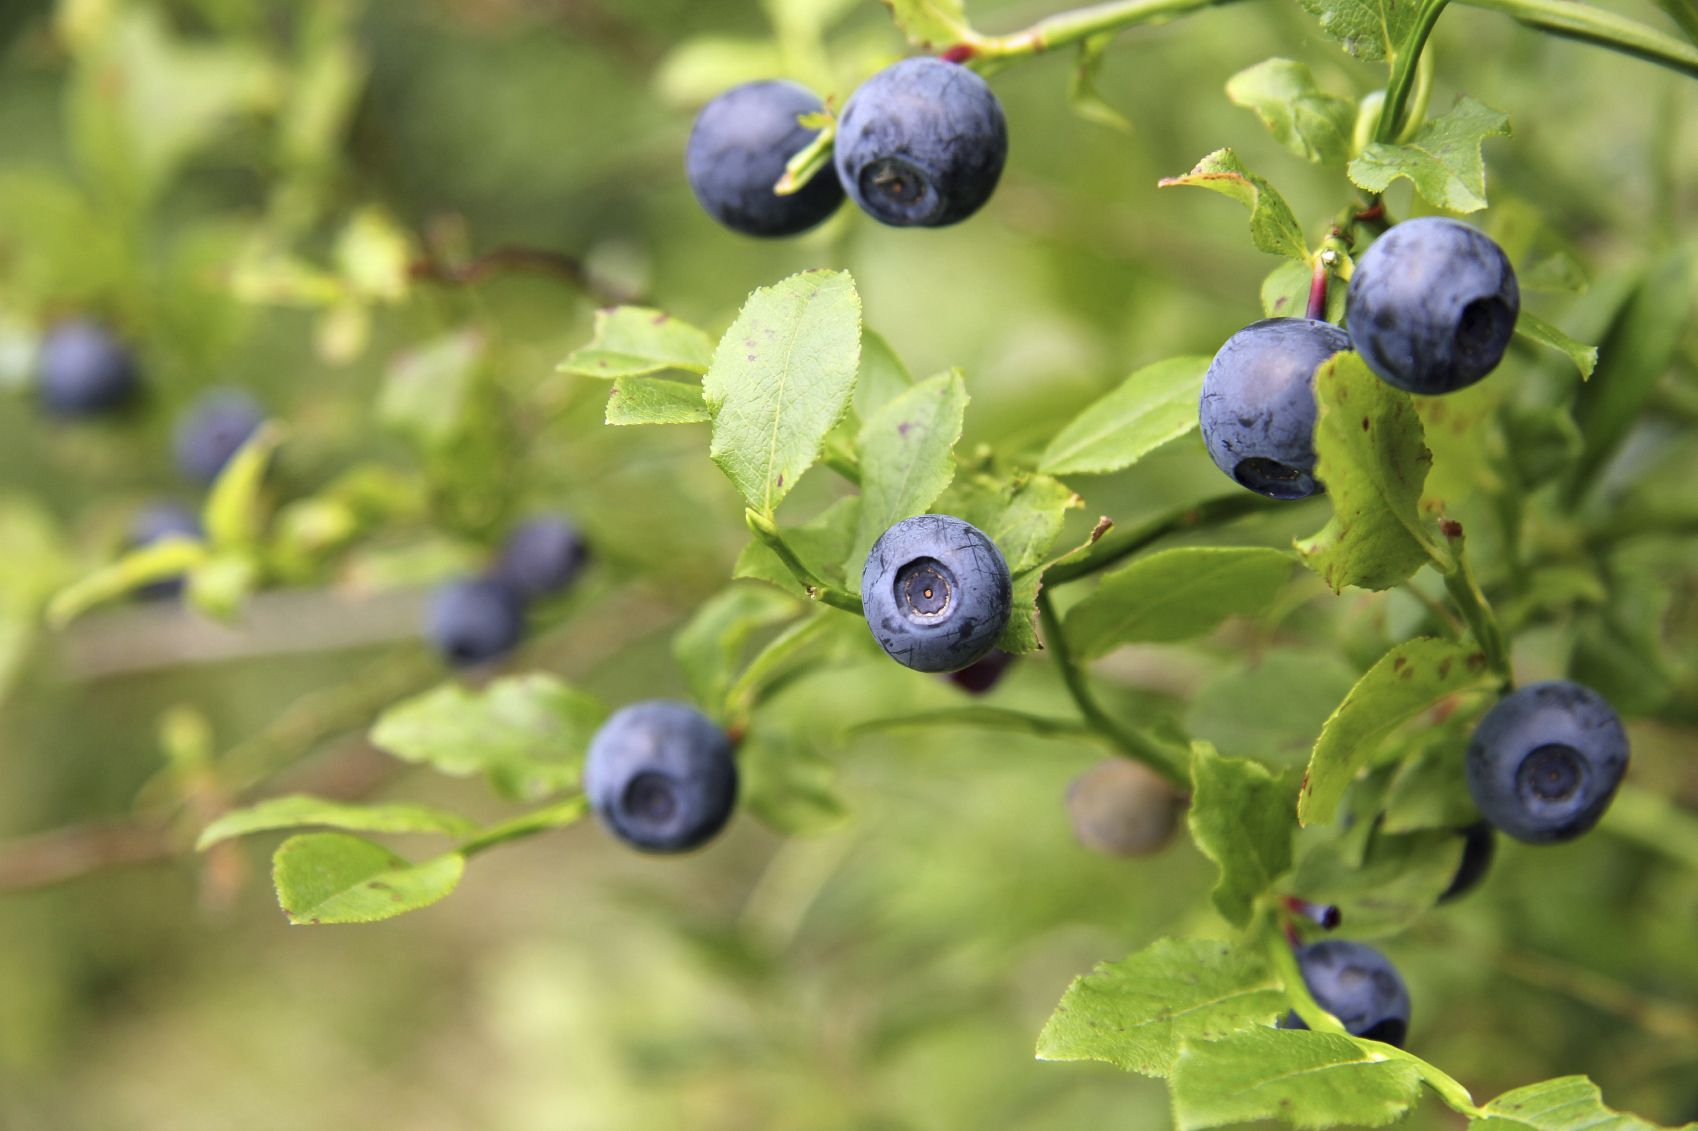 Fertilizing Blueberries Learn About Blueberry Bush